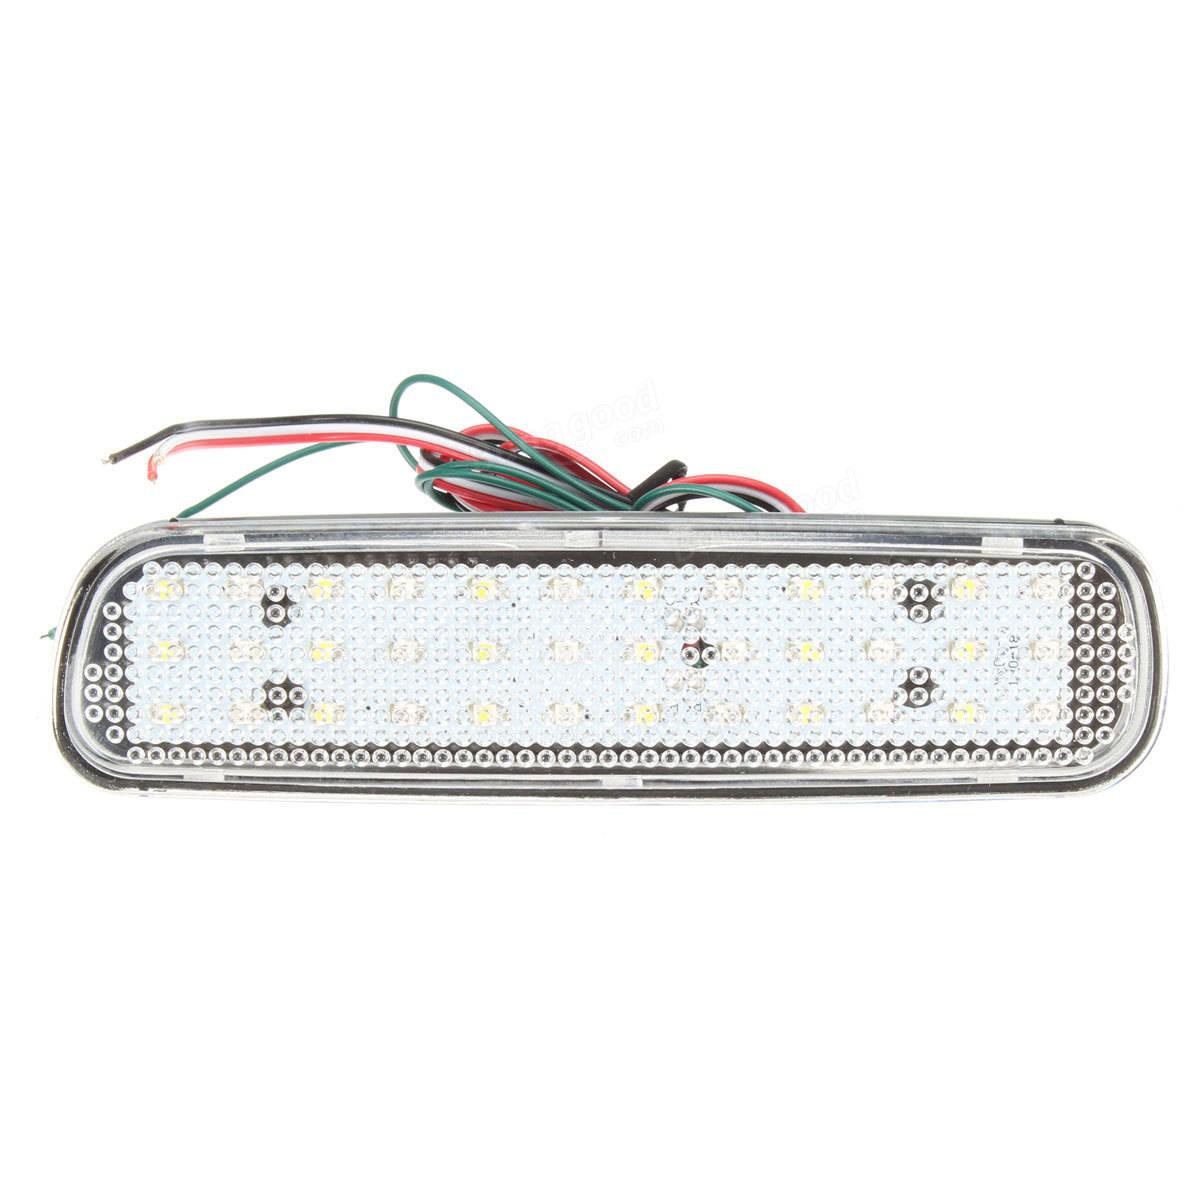 Pair Rear Bumper Reflector Led Brake Tail Turn Signal Light Fog Lamp For Lexus Lx470 Sale